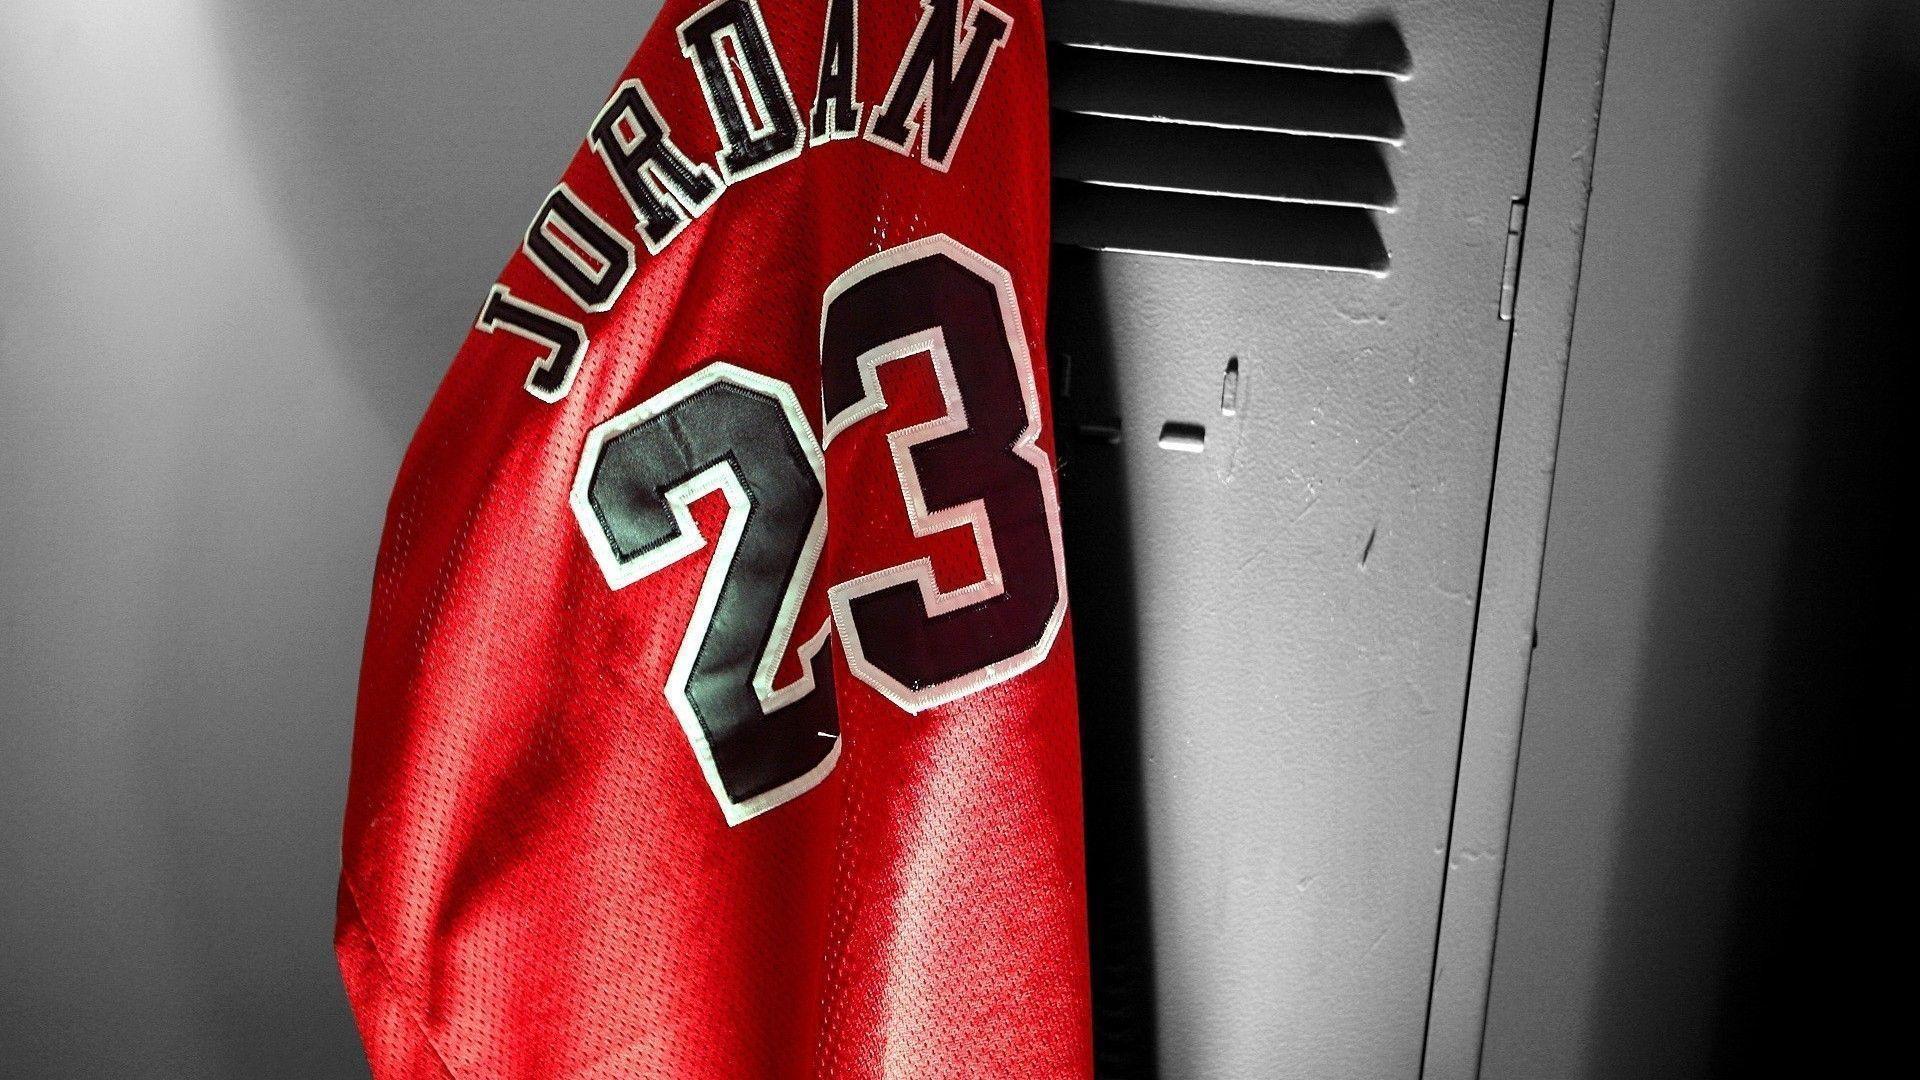 Michael-Jordan-Tshirt-Chicago-Bulls-Wallpaper Chicago Wallpapers ...